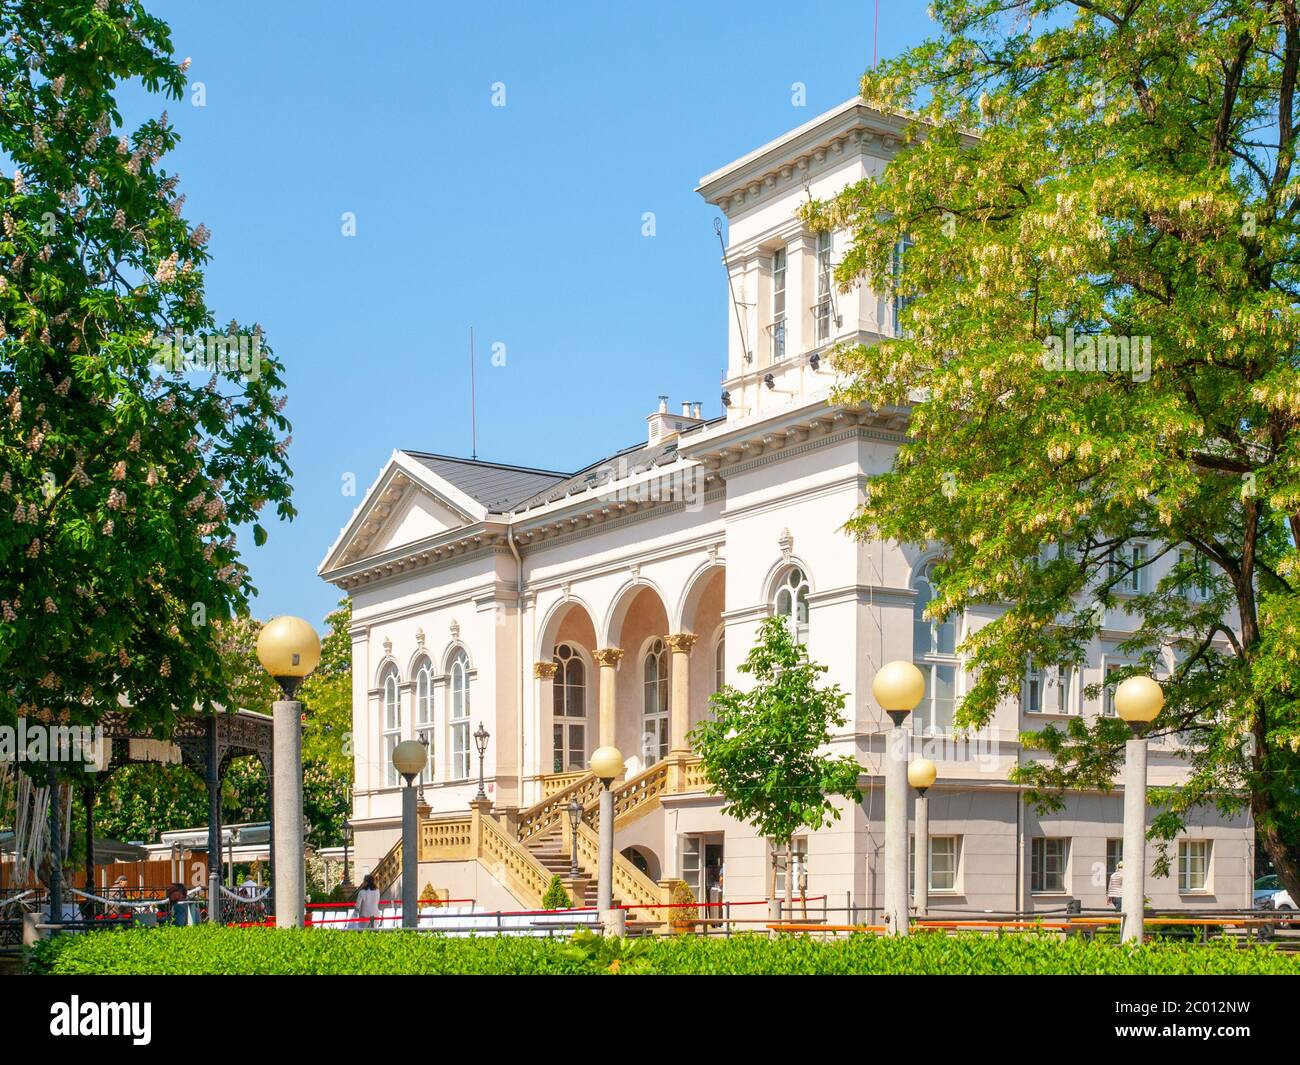 Letna Chateau, aka Letensky zamecek, in Letna park, Prague, Czech Republic Stock Photo